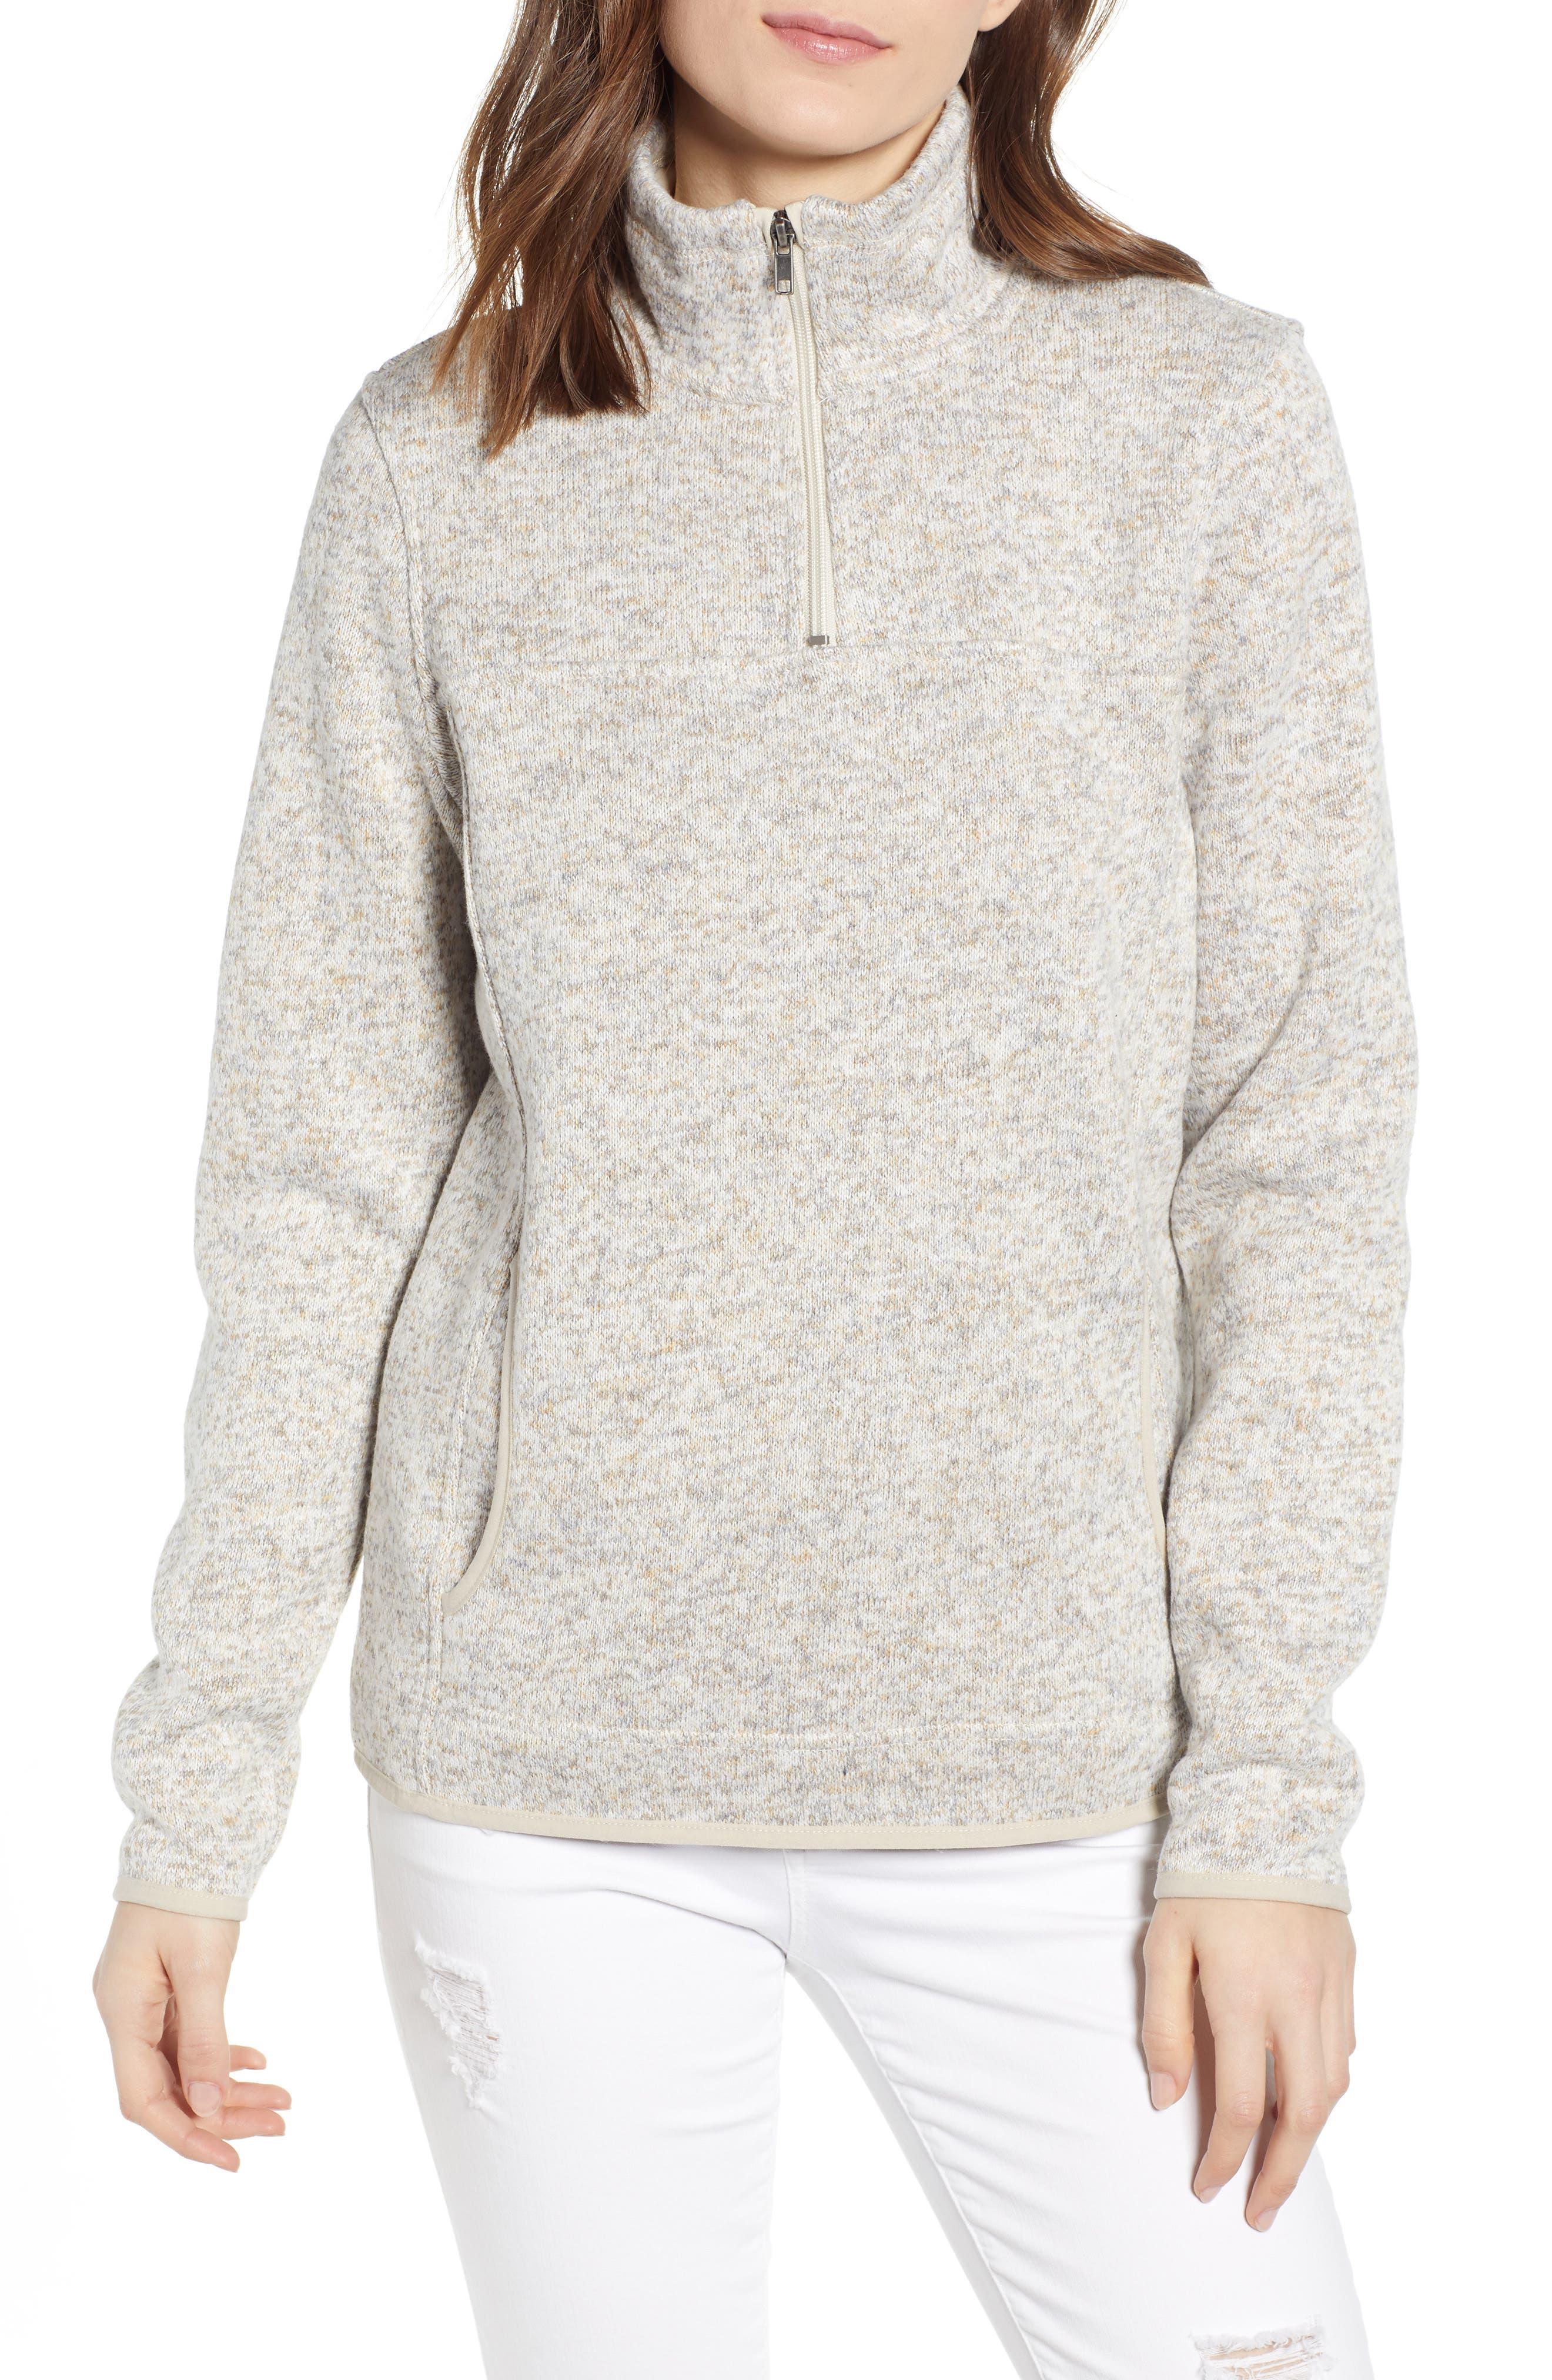 THREAD & SUPPLY Madison Fleece Jacket, Main, color, HEATHER OATMEAL